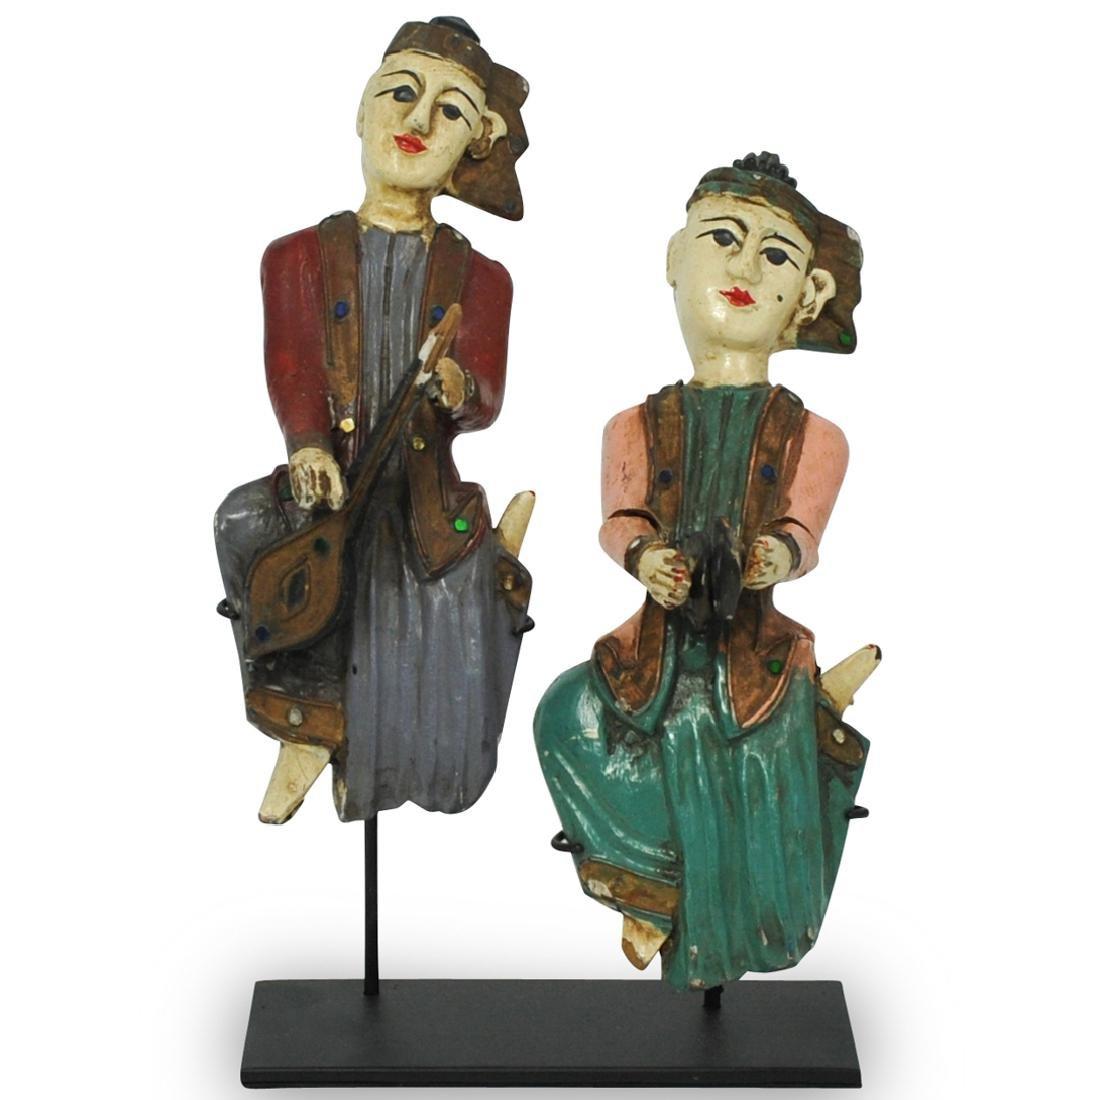 (2 Pc) Burmese Wood Carved Musician Figures